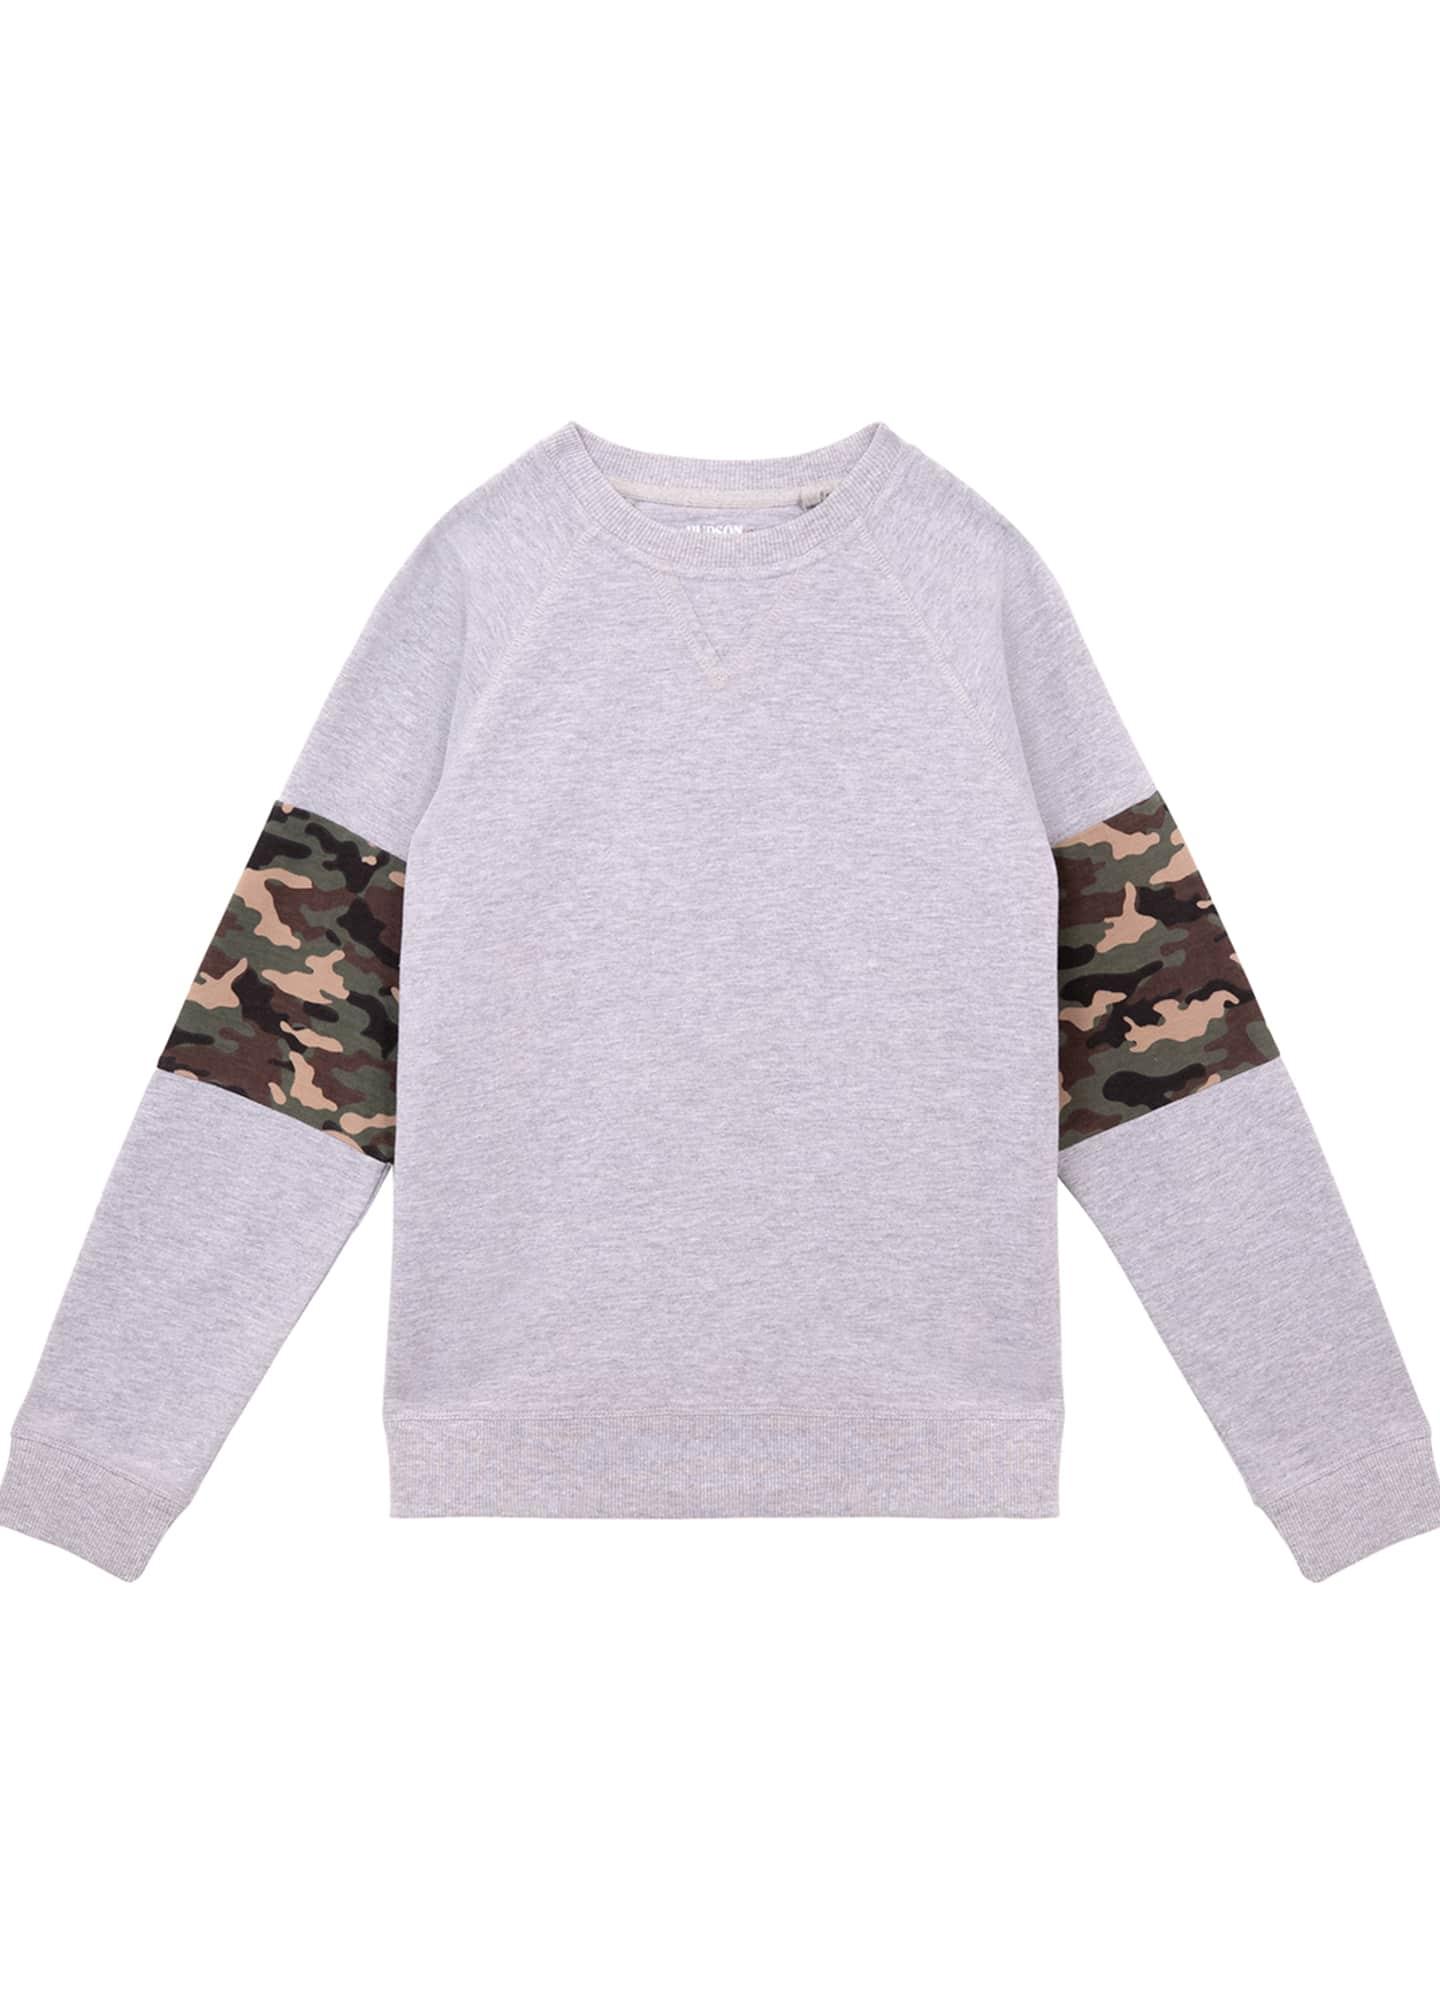 Hudson Boys' Zev Crewneck Pullover, Size S-XL